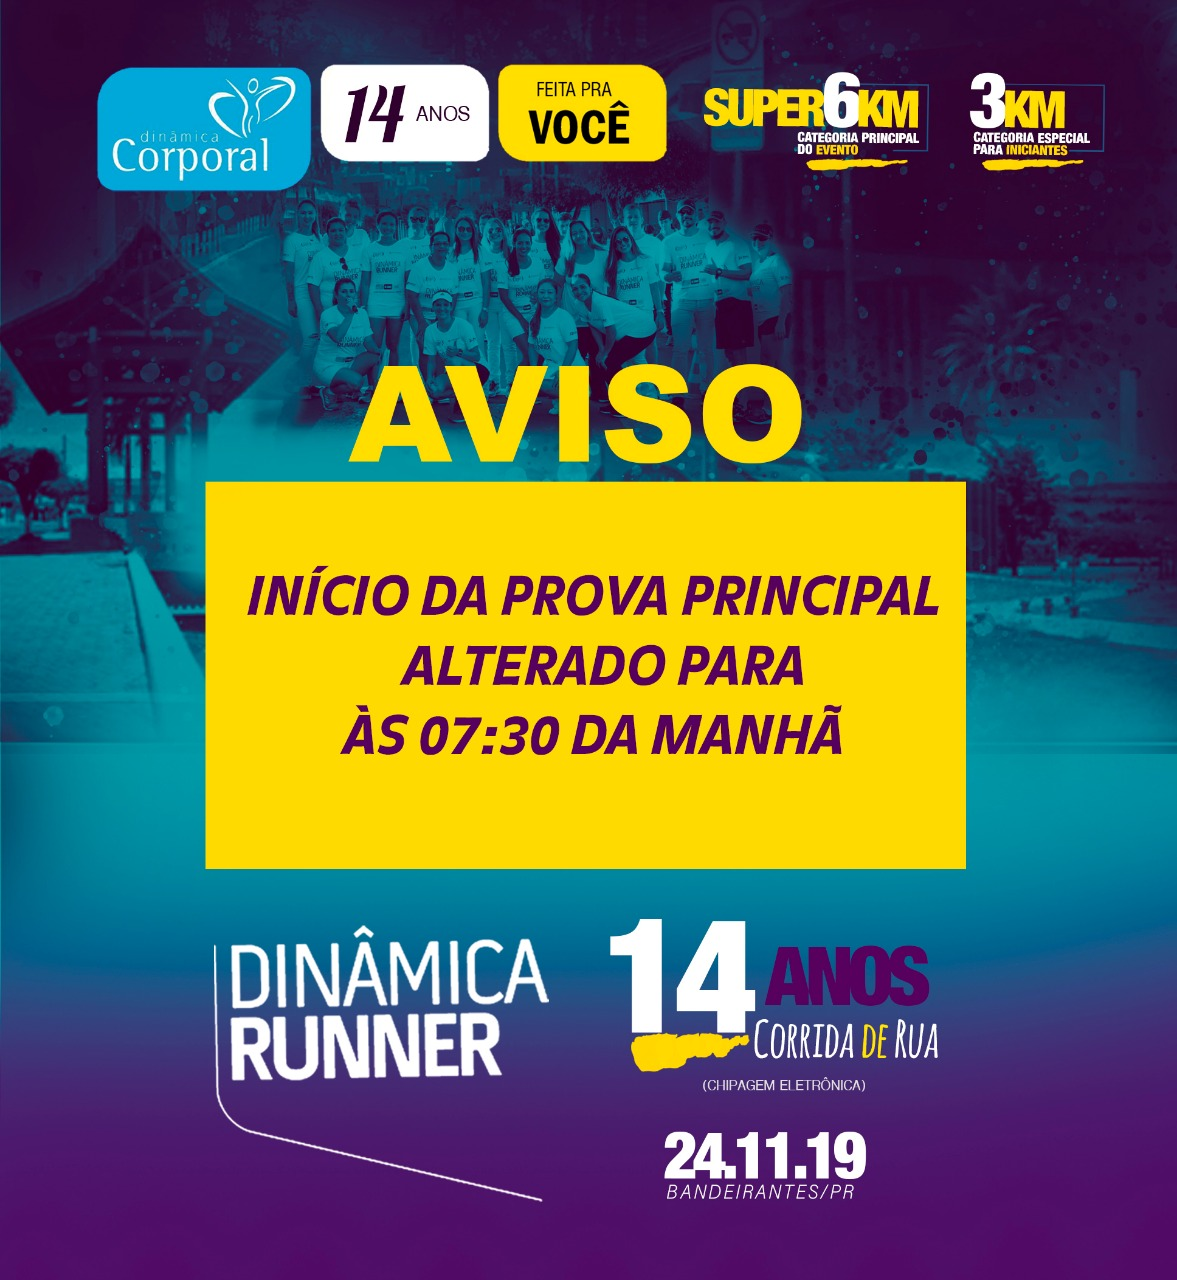 14ª CORRIDA DINÂMICA RUNNER